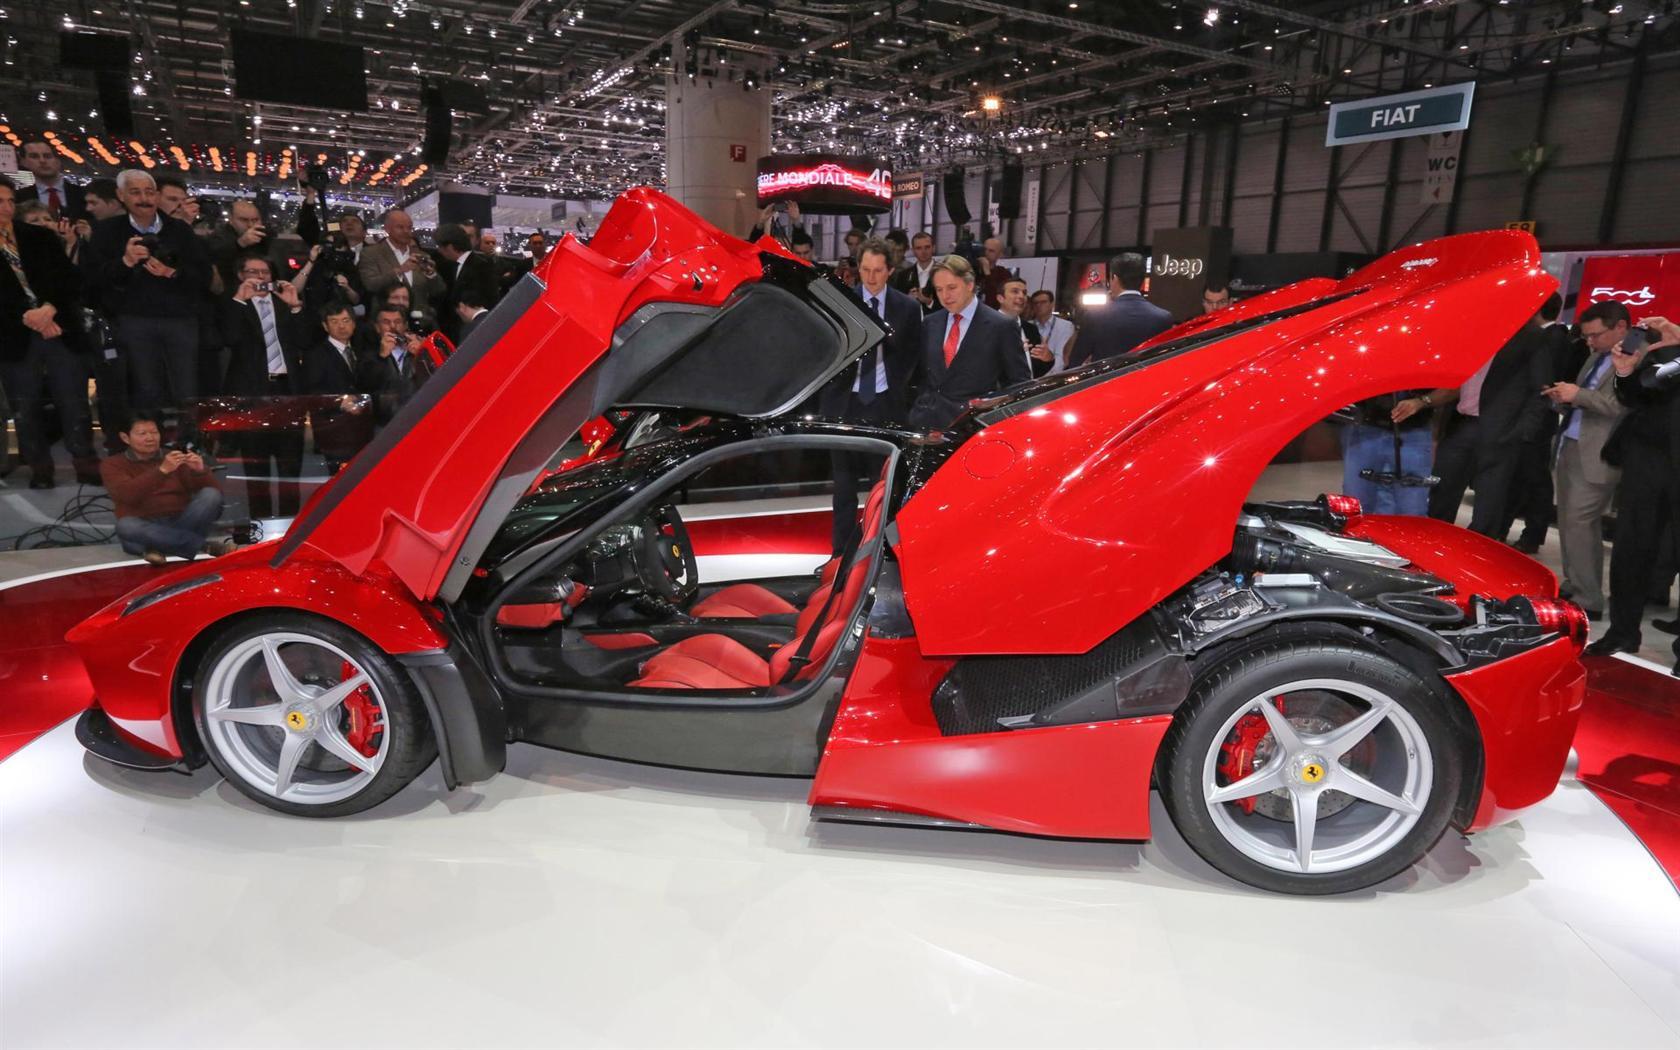 Ferrari Luxury Model Cars 20 Wide Car Wallpaper